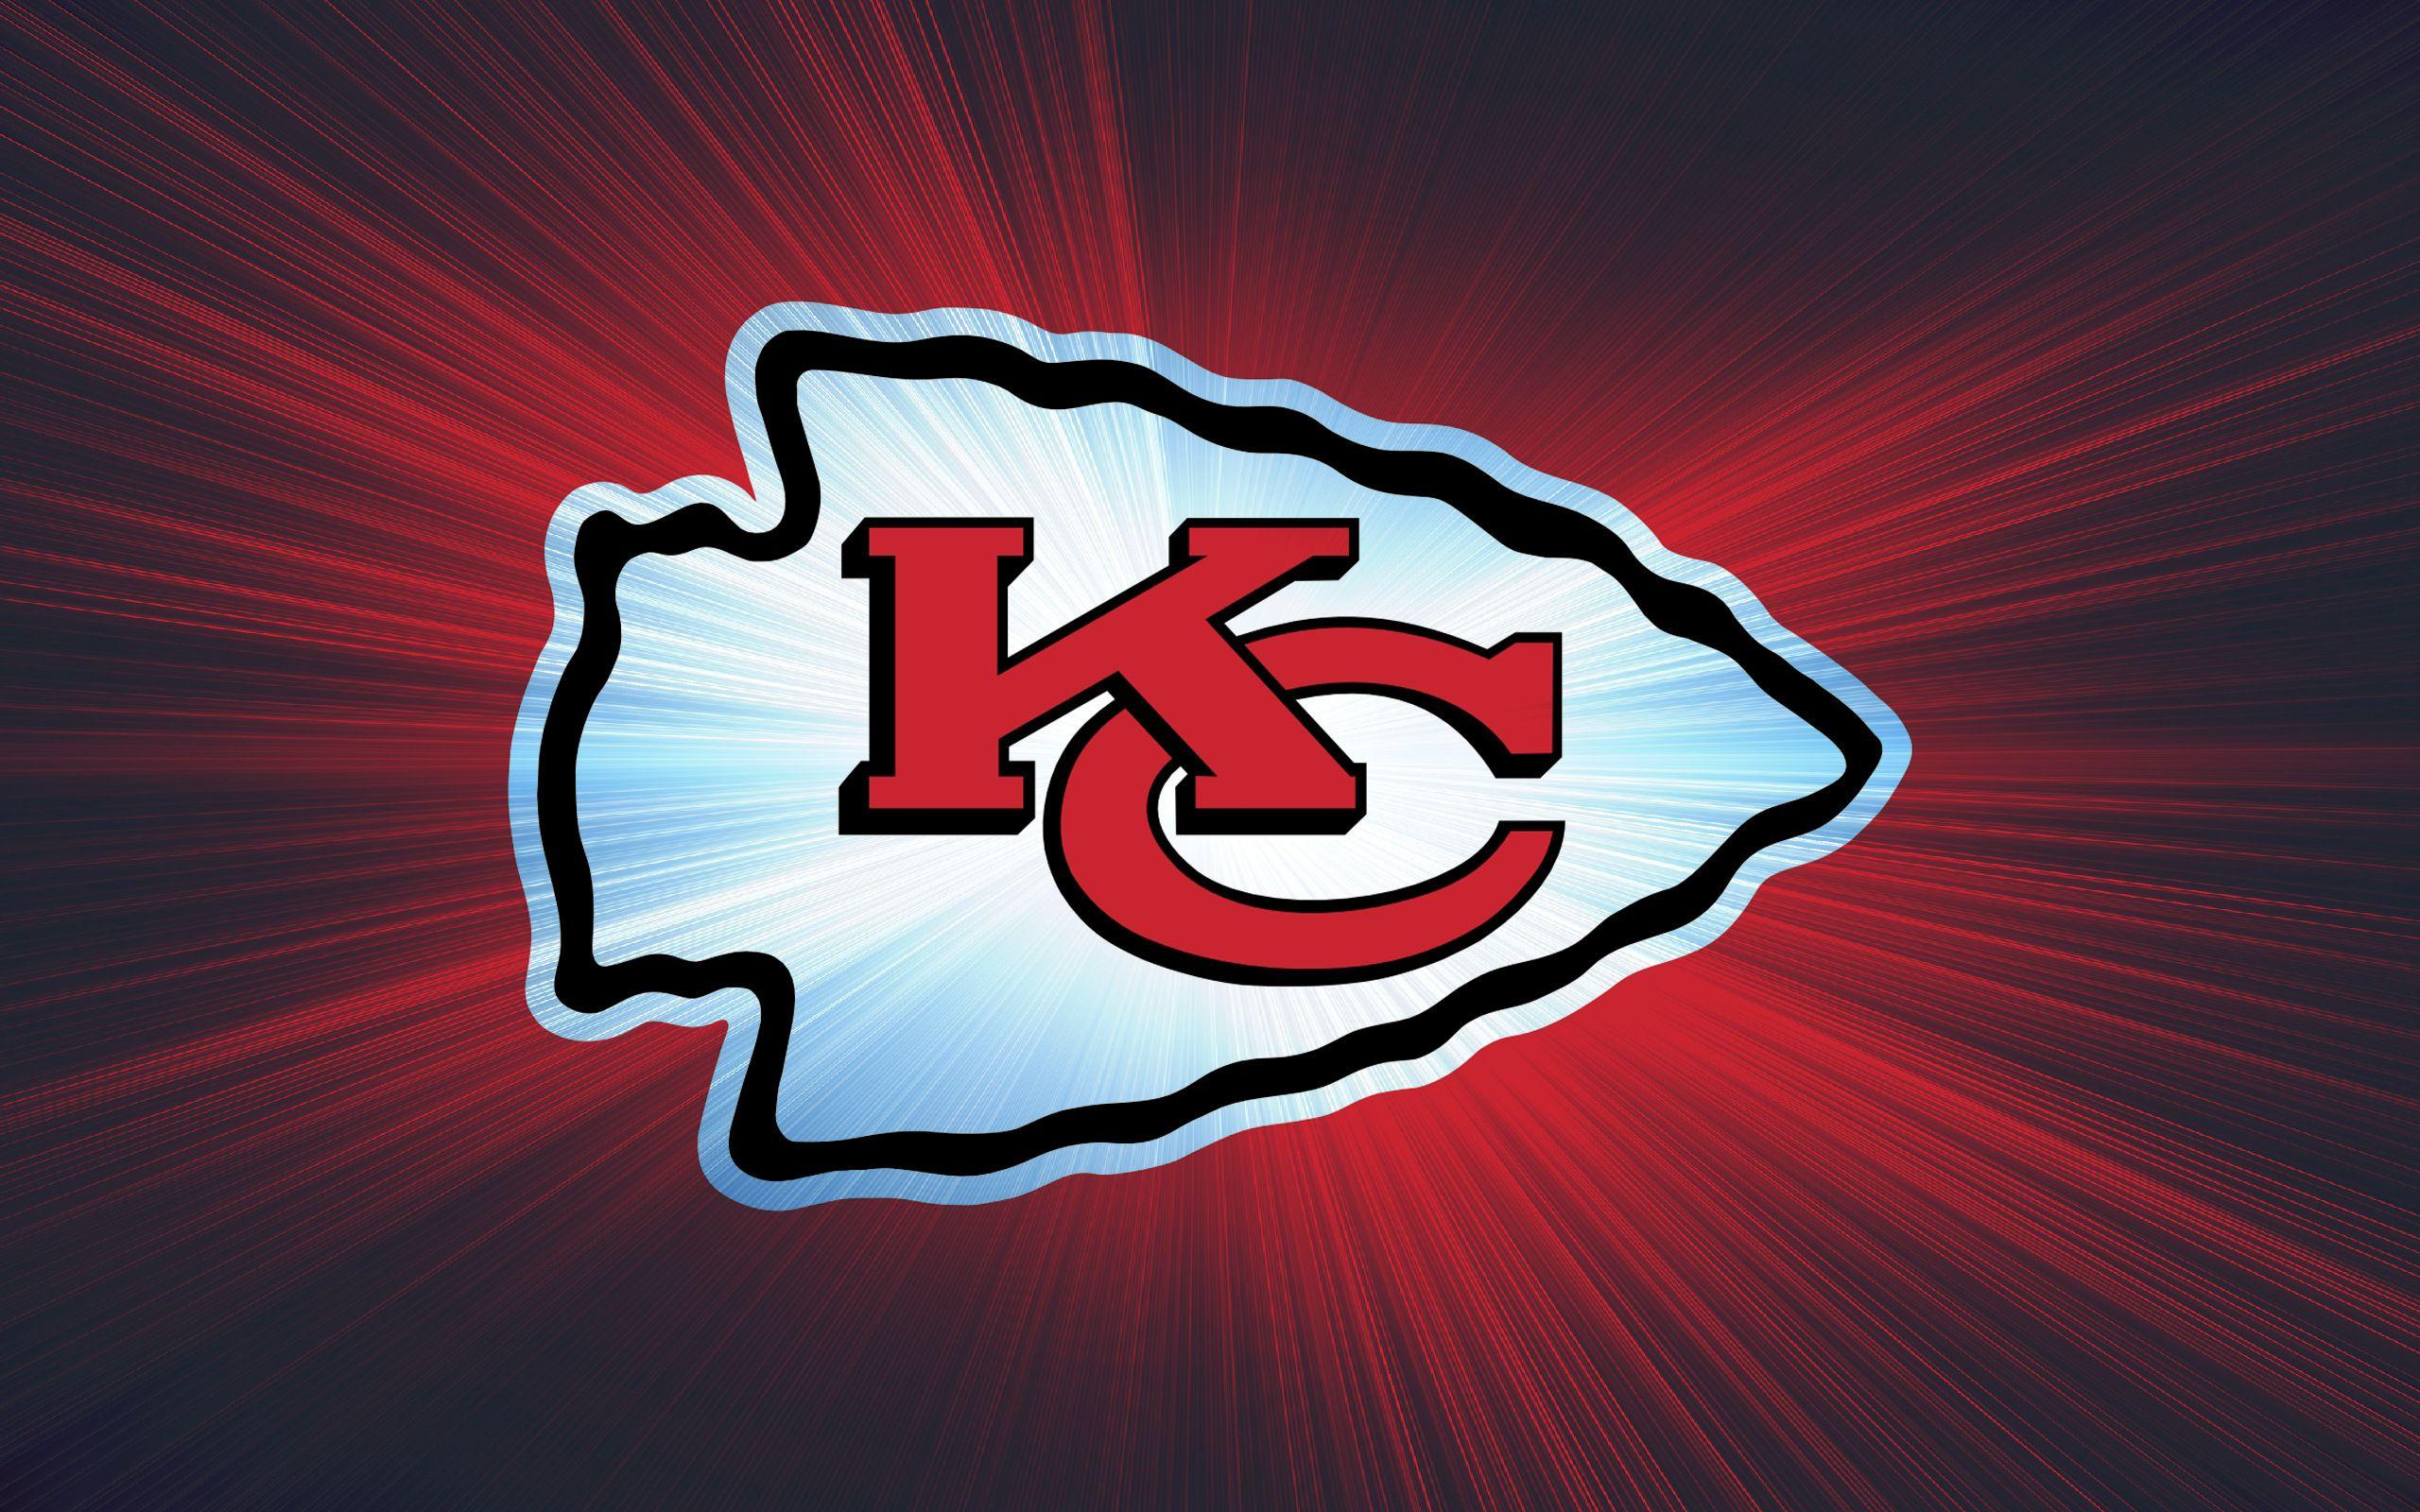 Baseball Kc Royals Wallpaper Kansas City Chiefs Logo Nfl Kansas City Chiefs Kansas City Chiefs